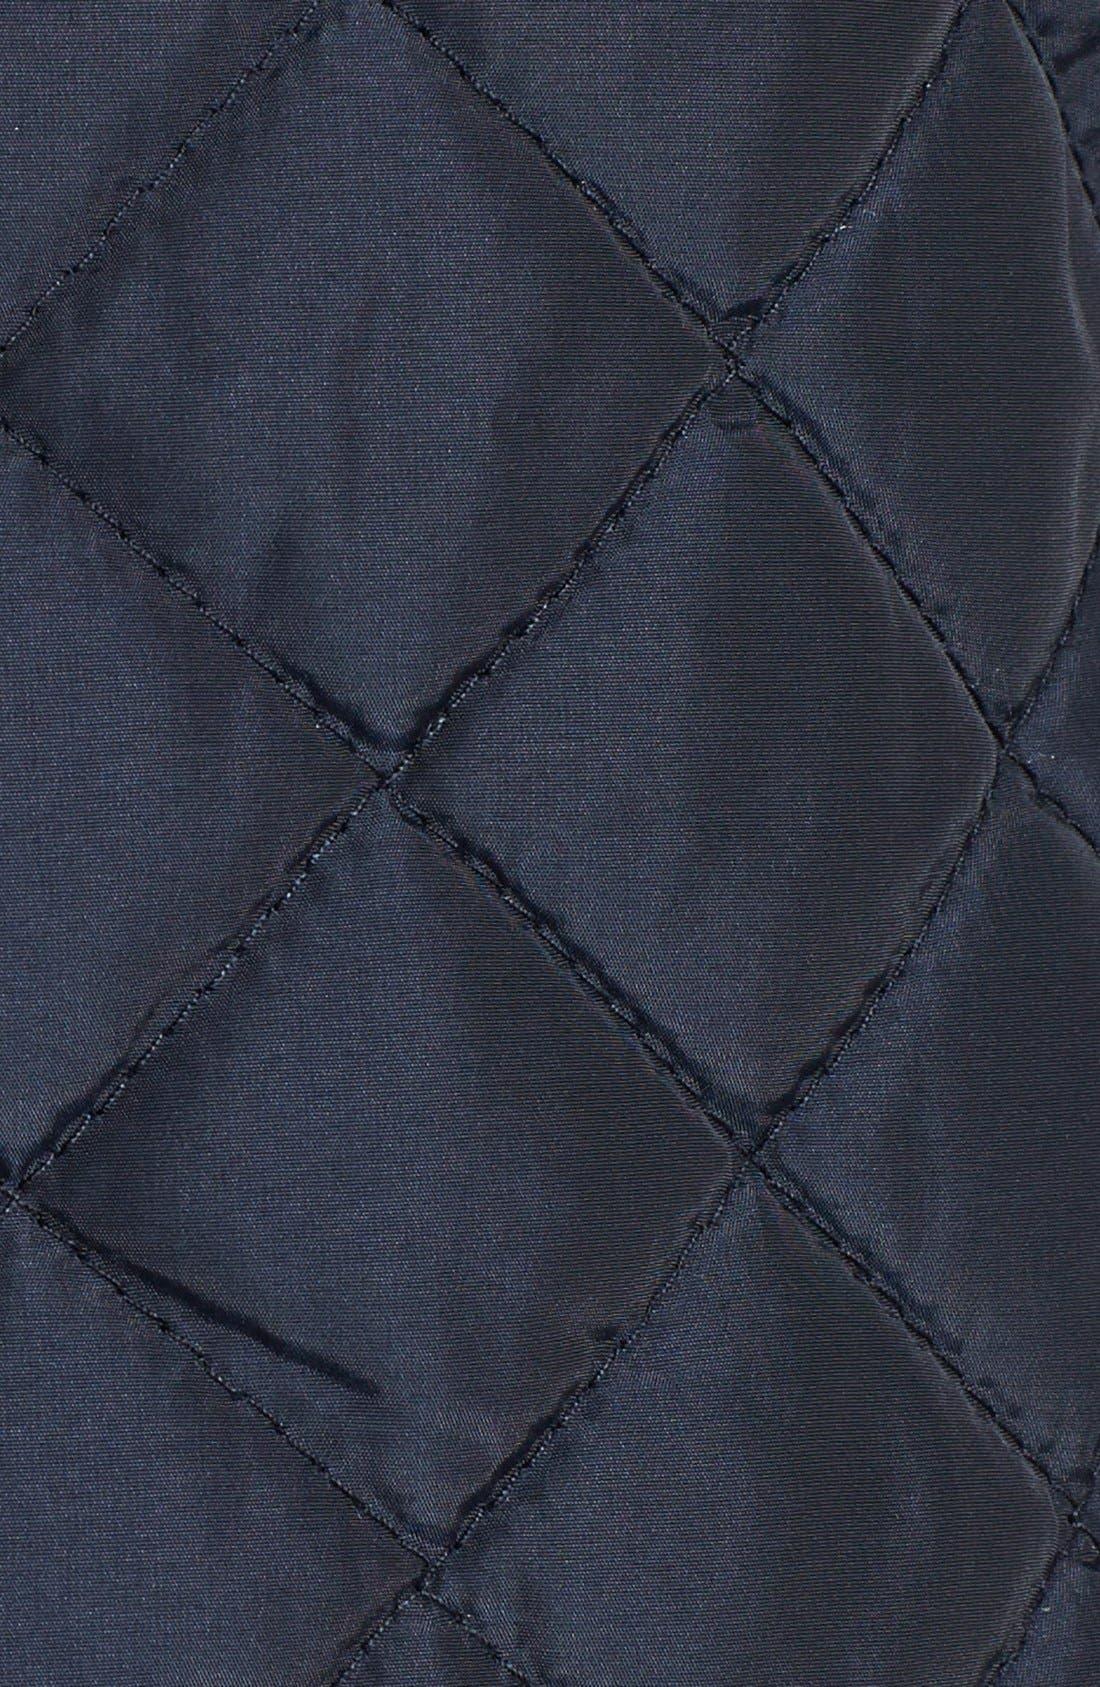 Short Sleeve Puffer Jacket,                             Alternate thumbnail 3, color,                             415